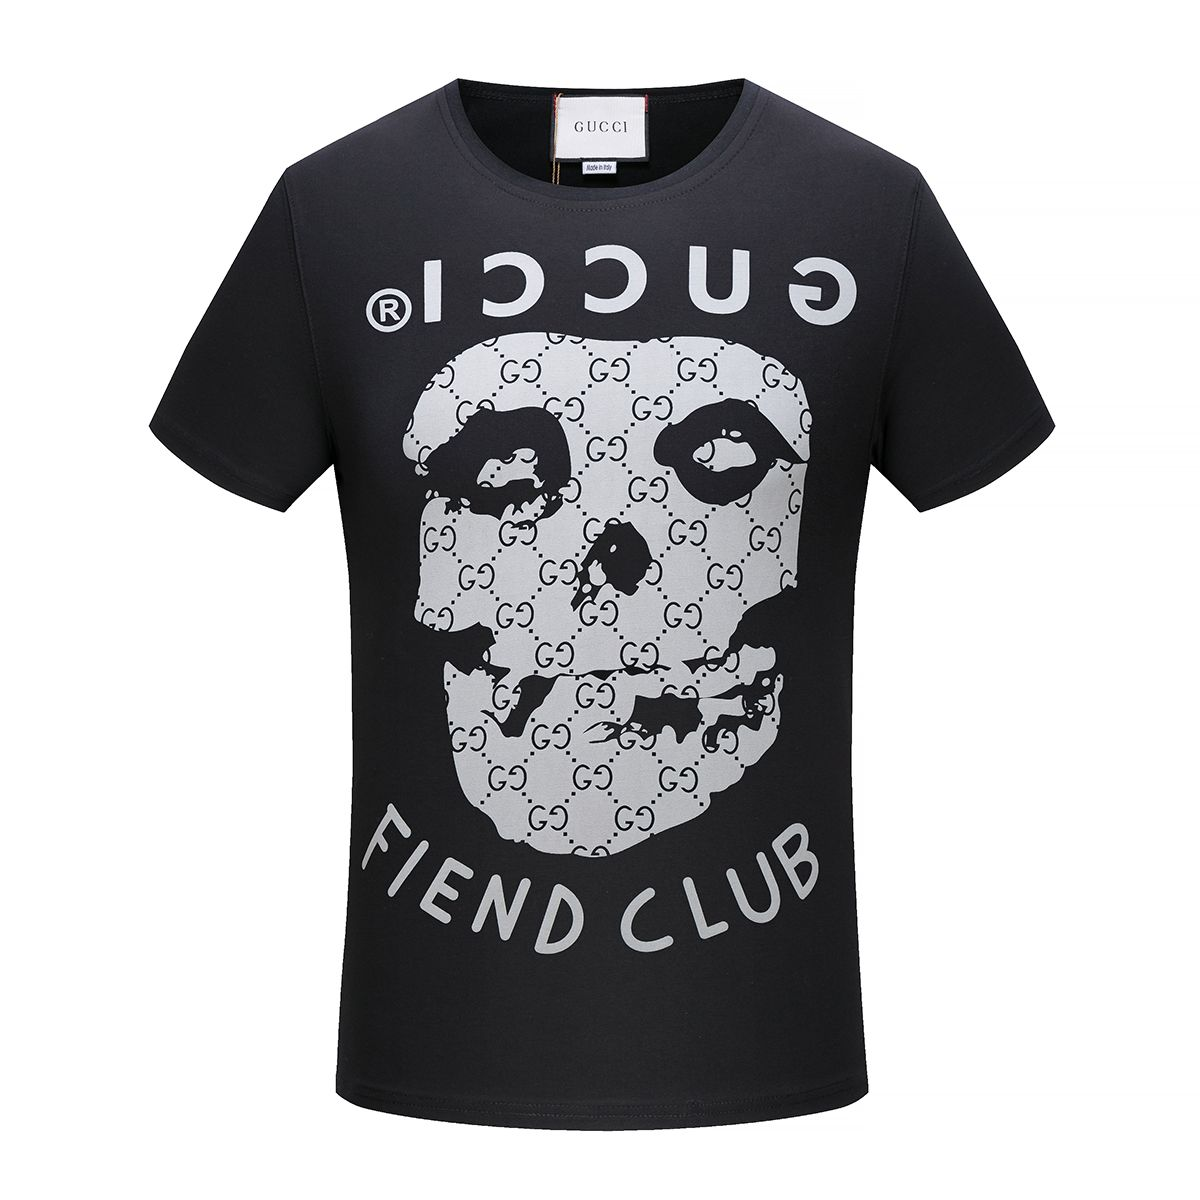 Replica GUCCI T Shirt 2018 For Men Size M-XXXL ID  ID 37842  9cbe0449524